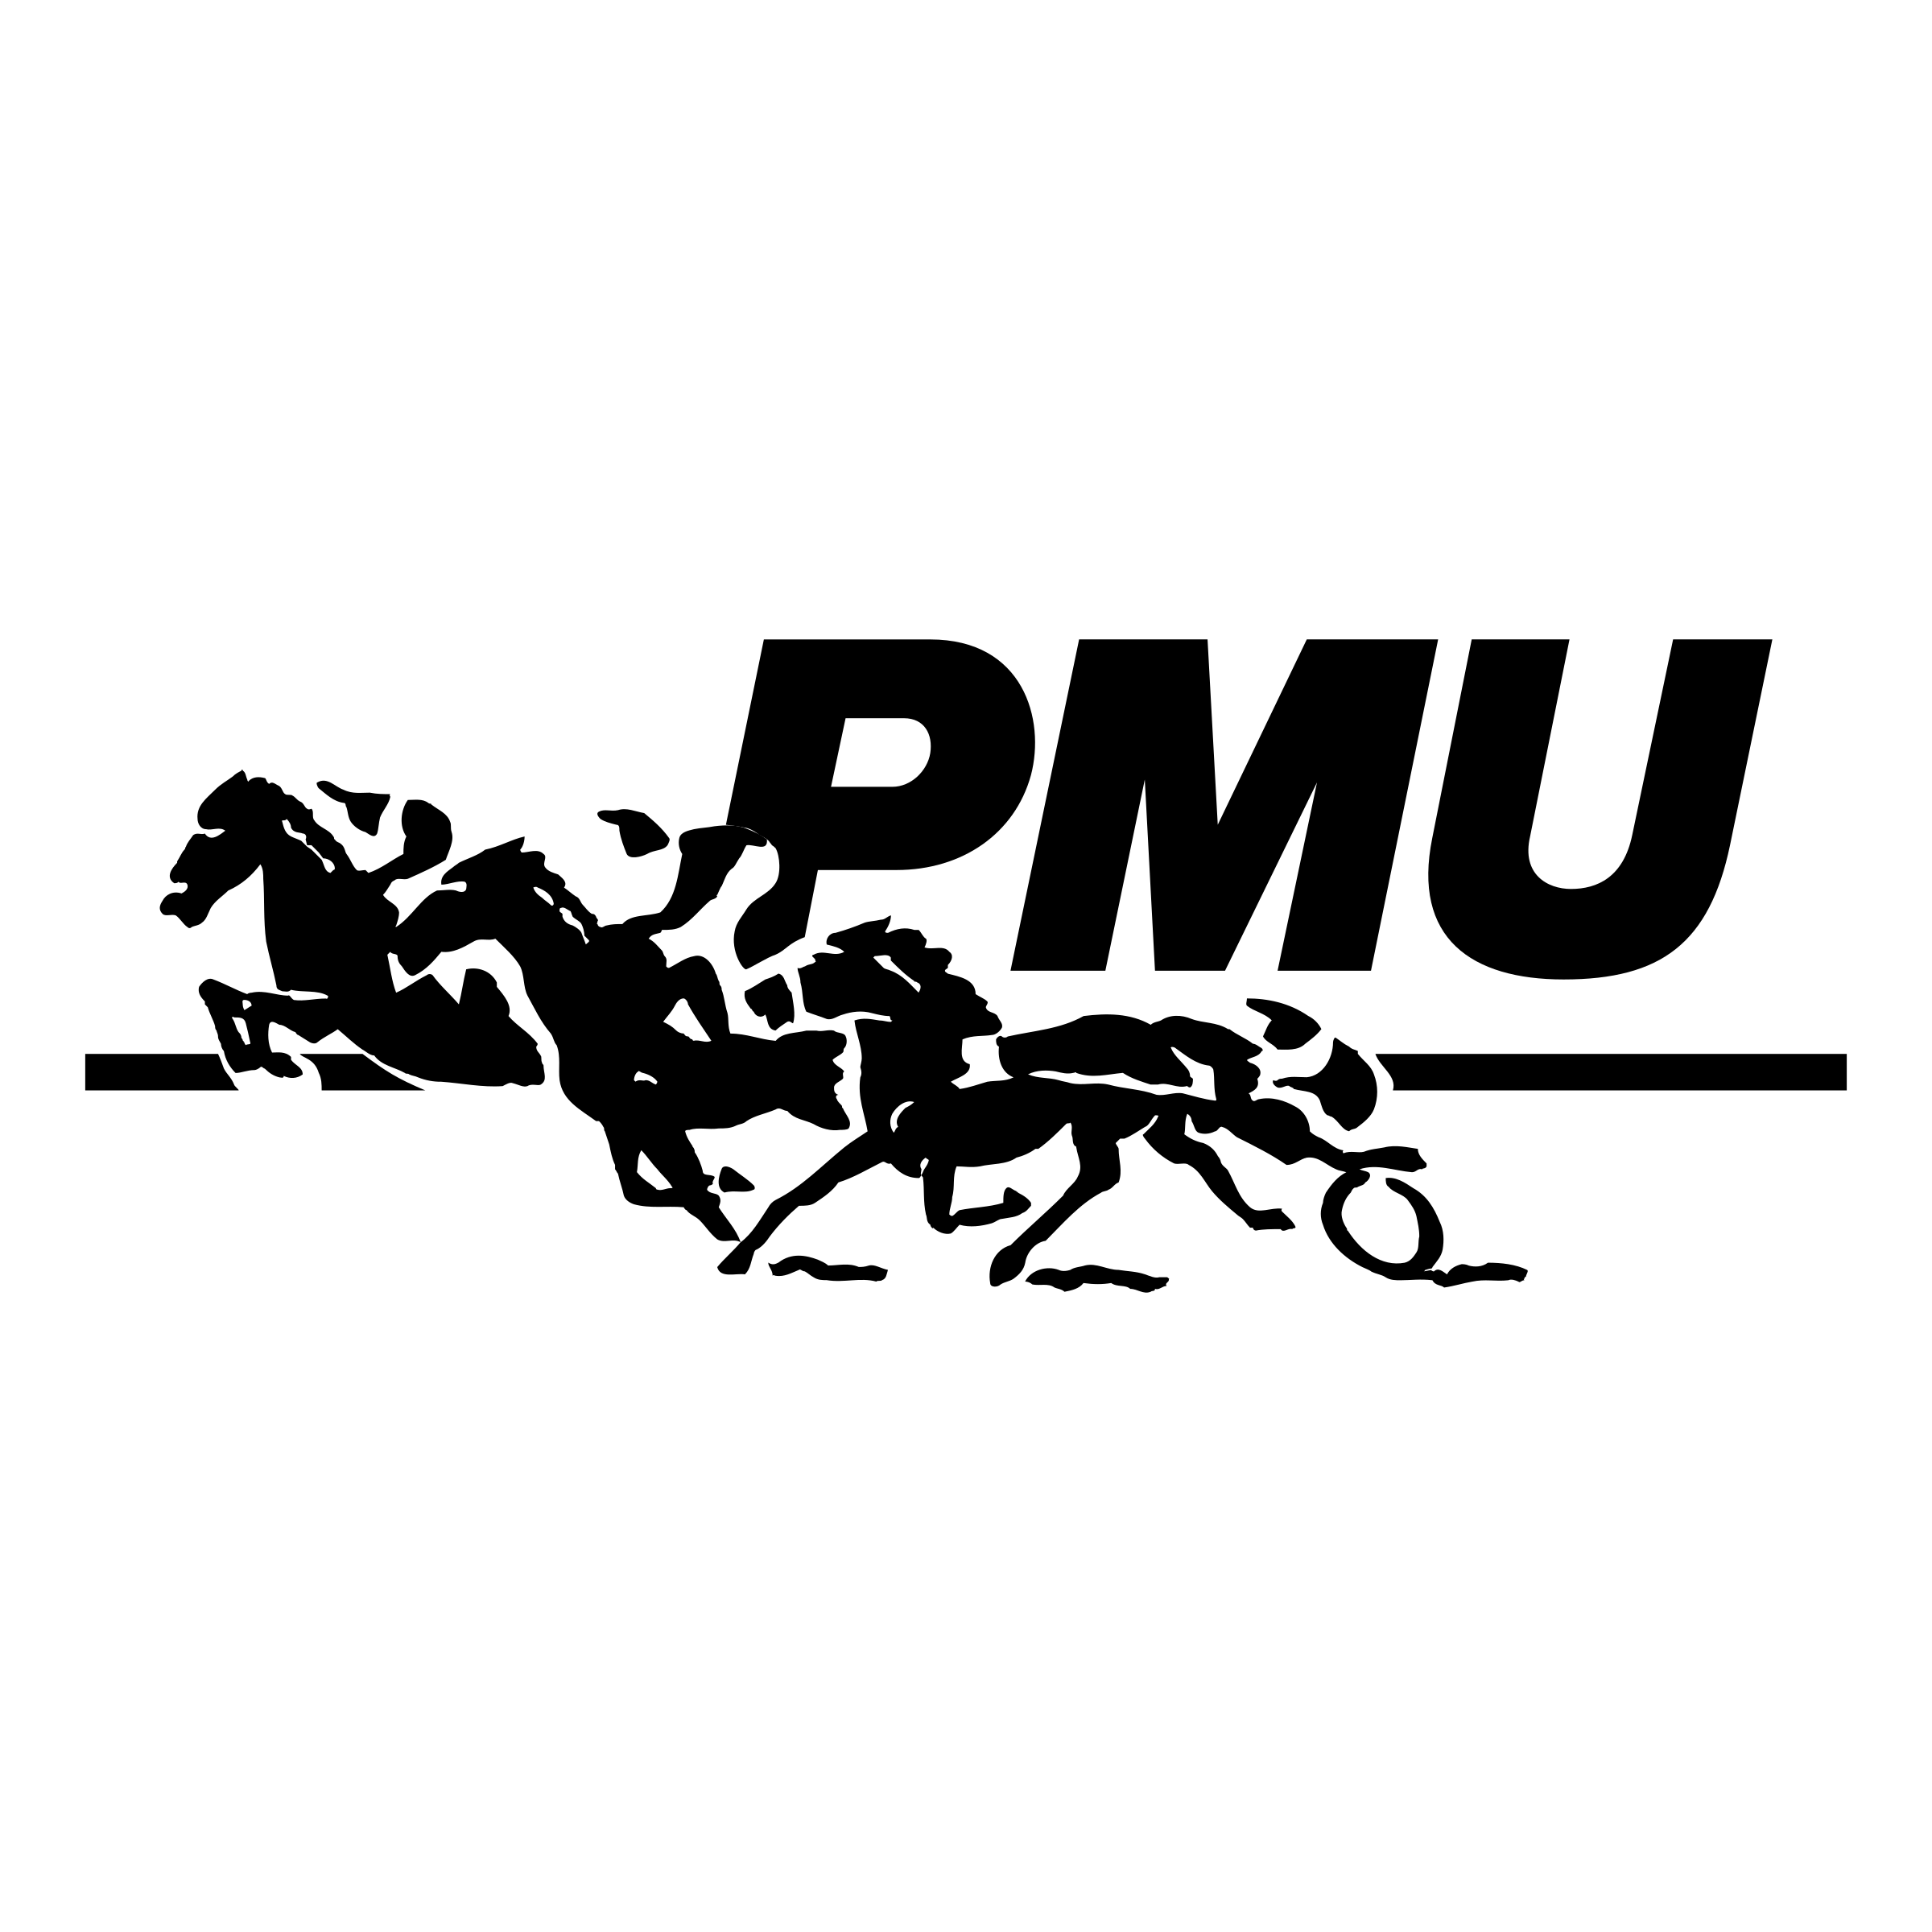 PMU Logo PNG Transparent & SVG Vector.